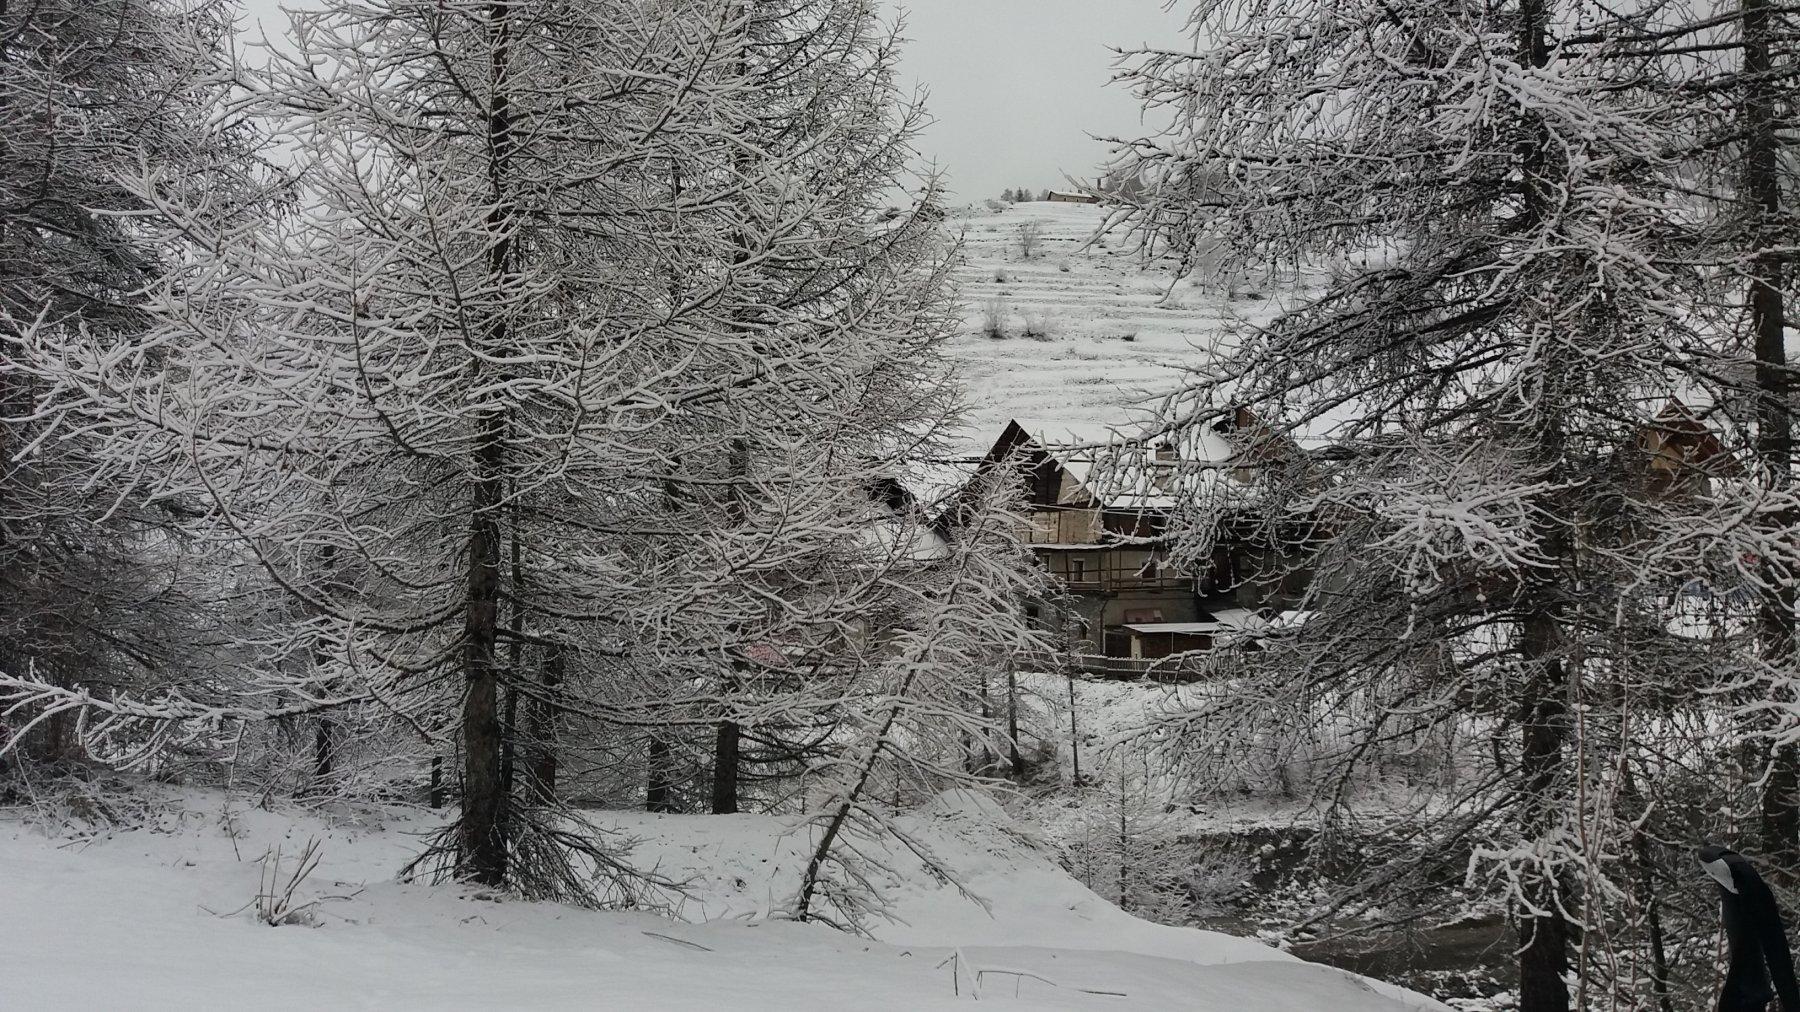 Poca neve alla partenza